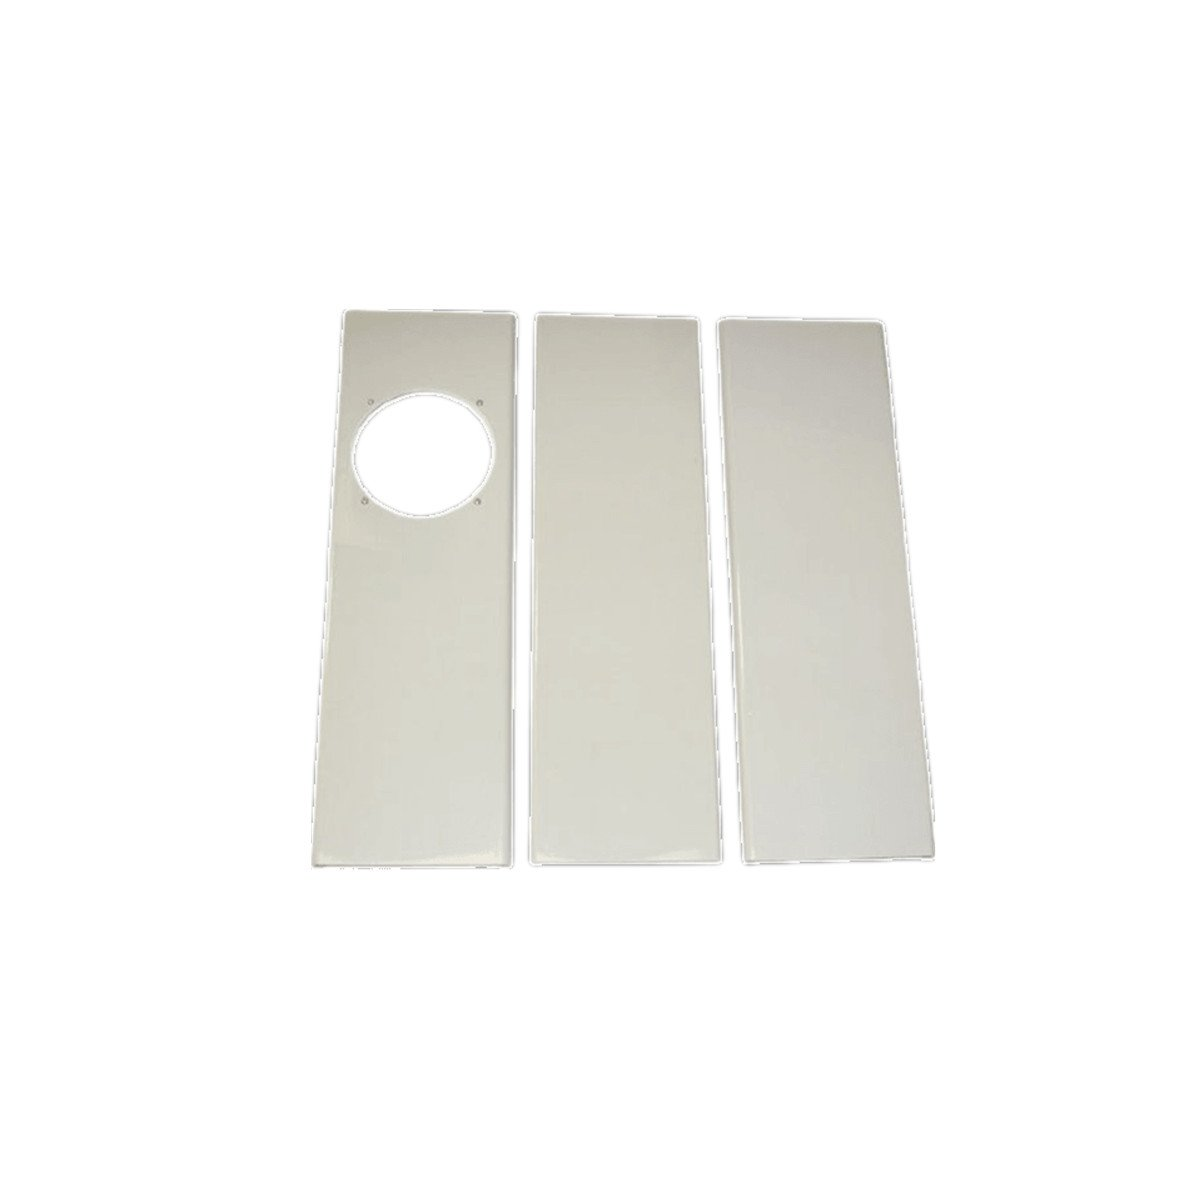 Sunpentown Plastic Window Kit for Portable AC